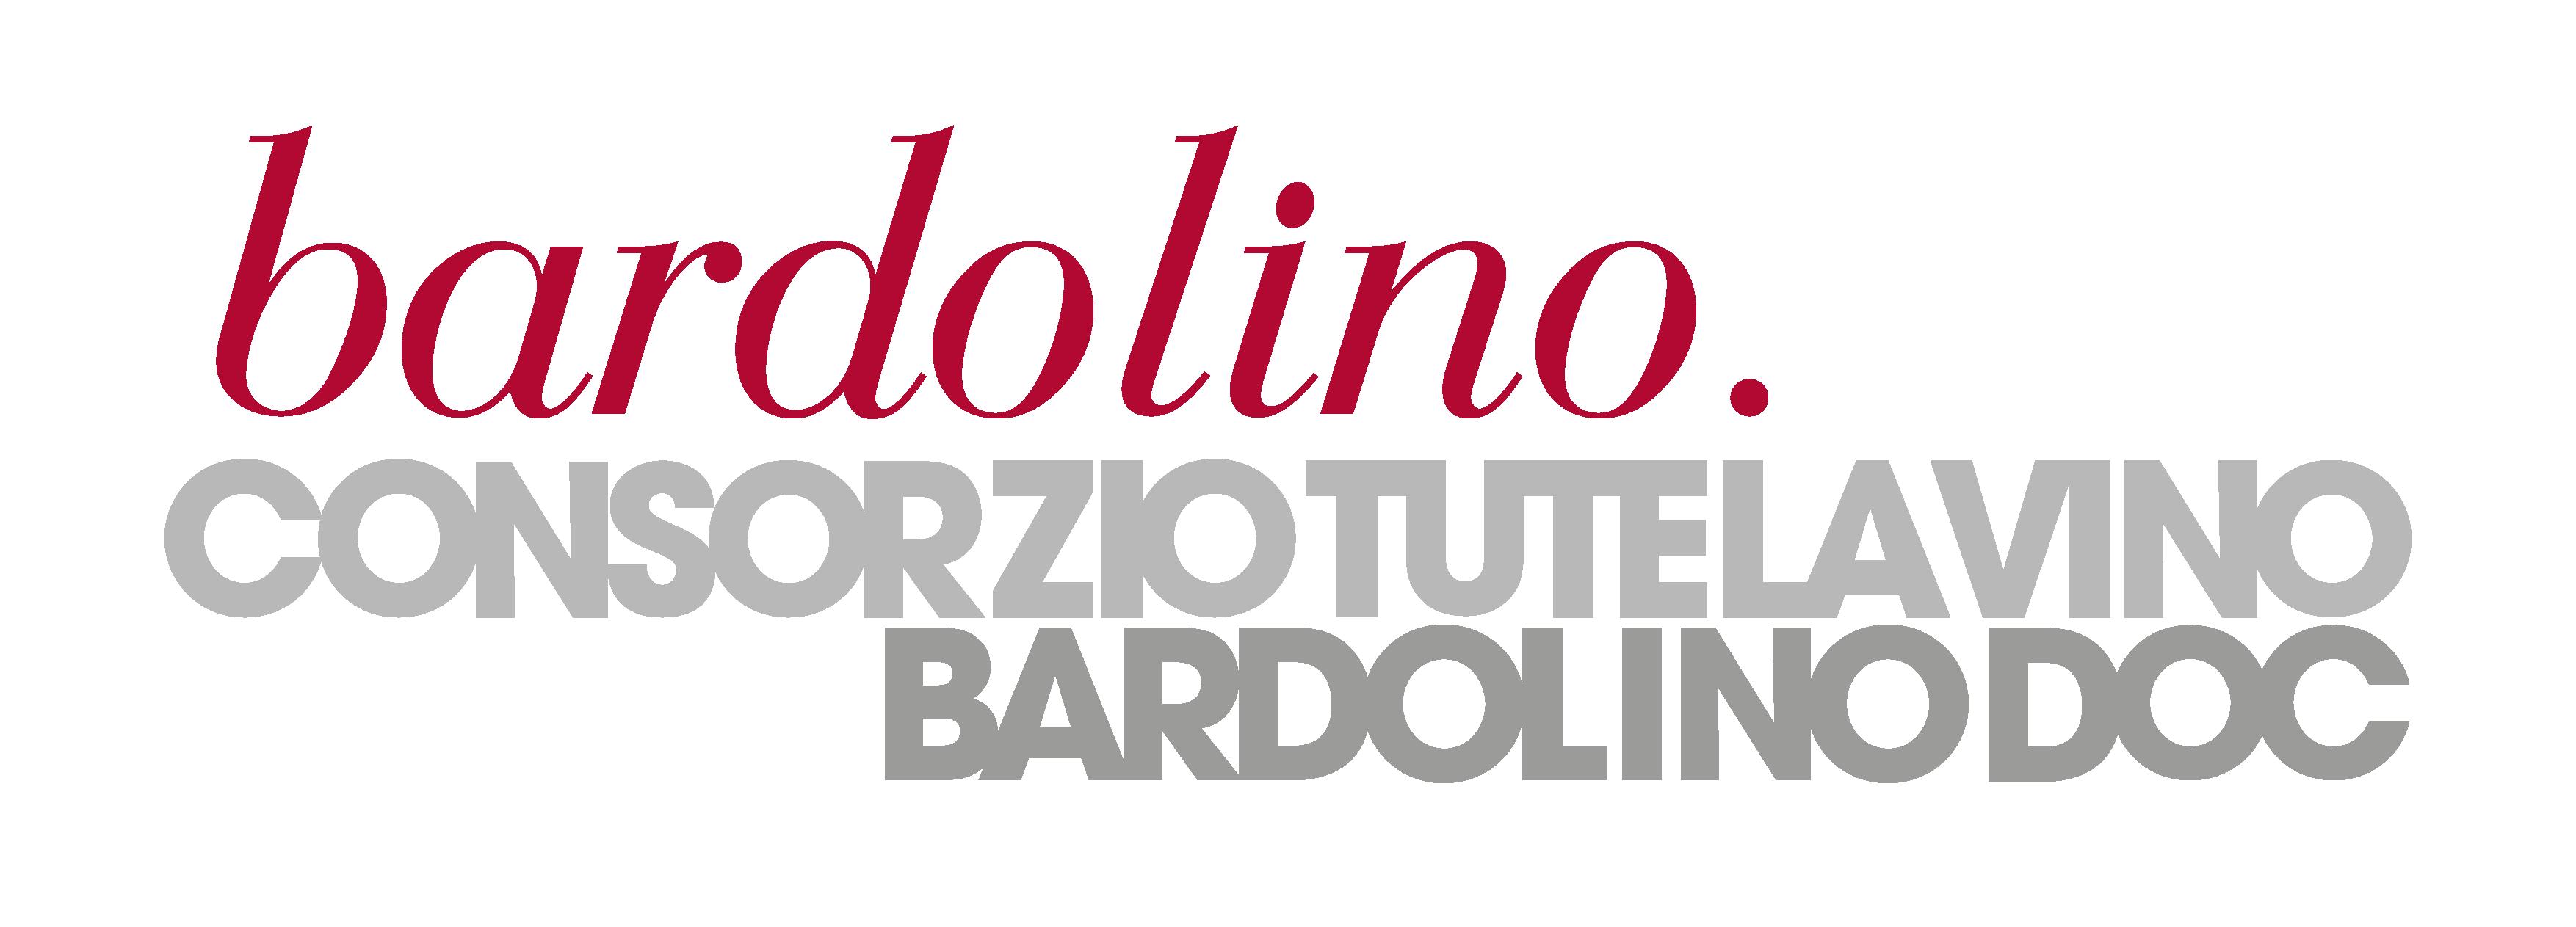 logo_consorzio_bardolino